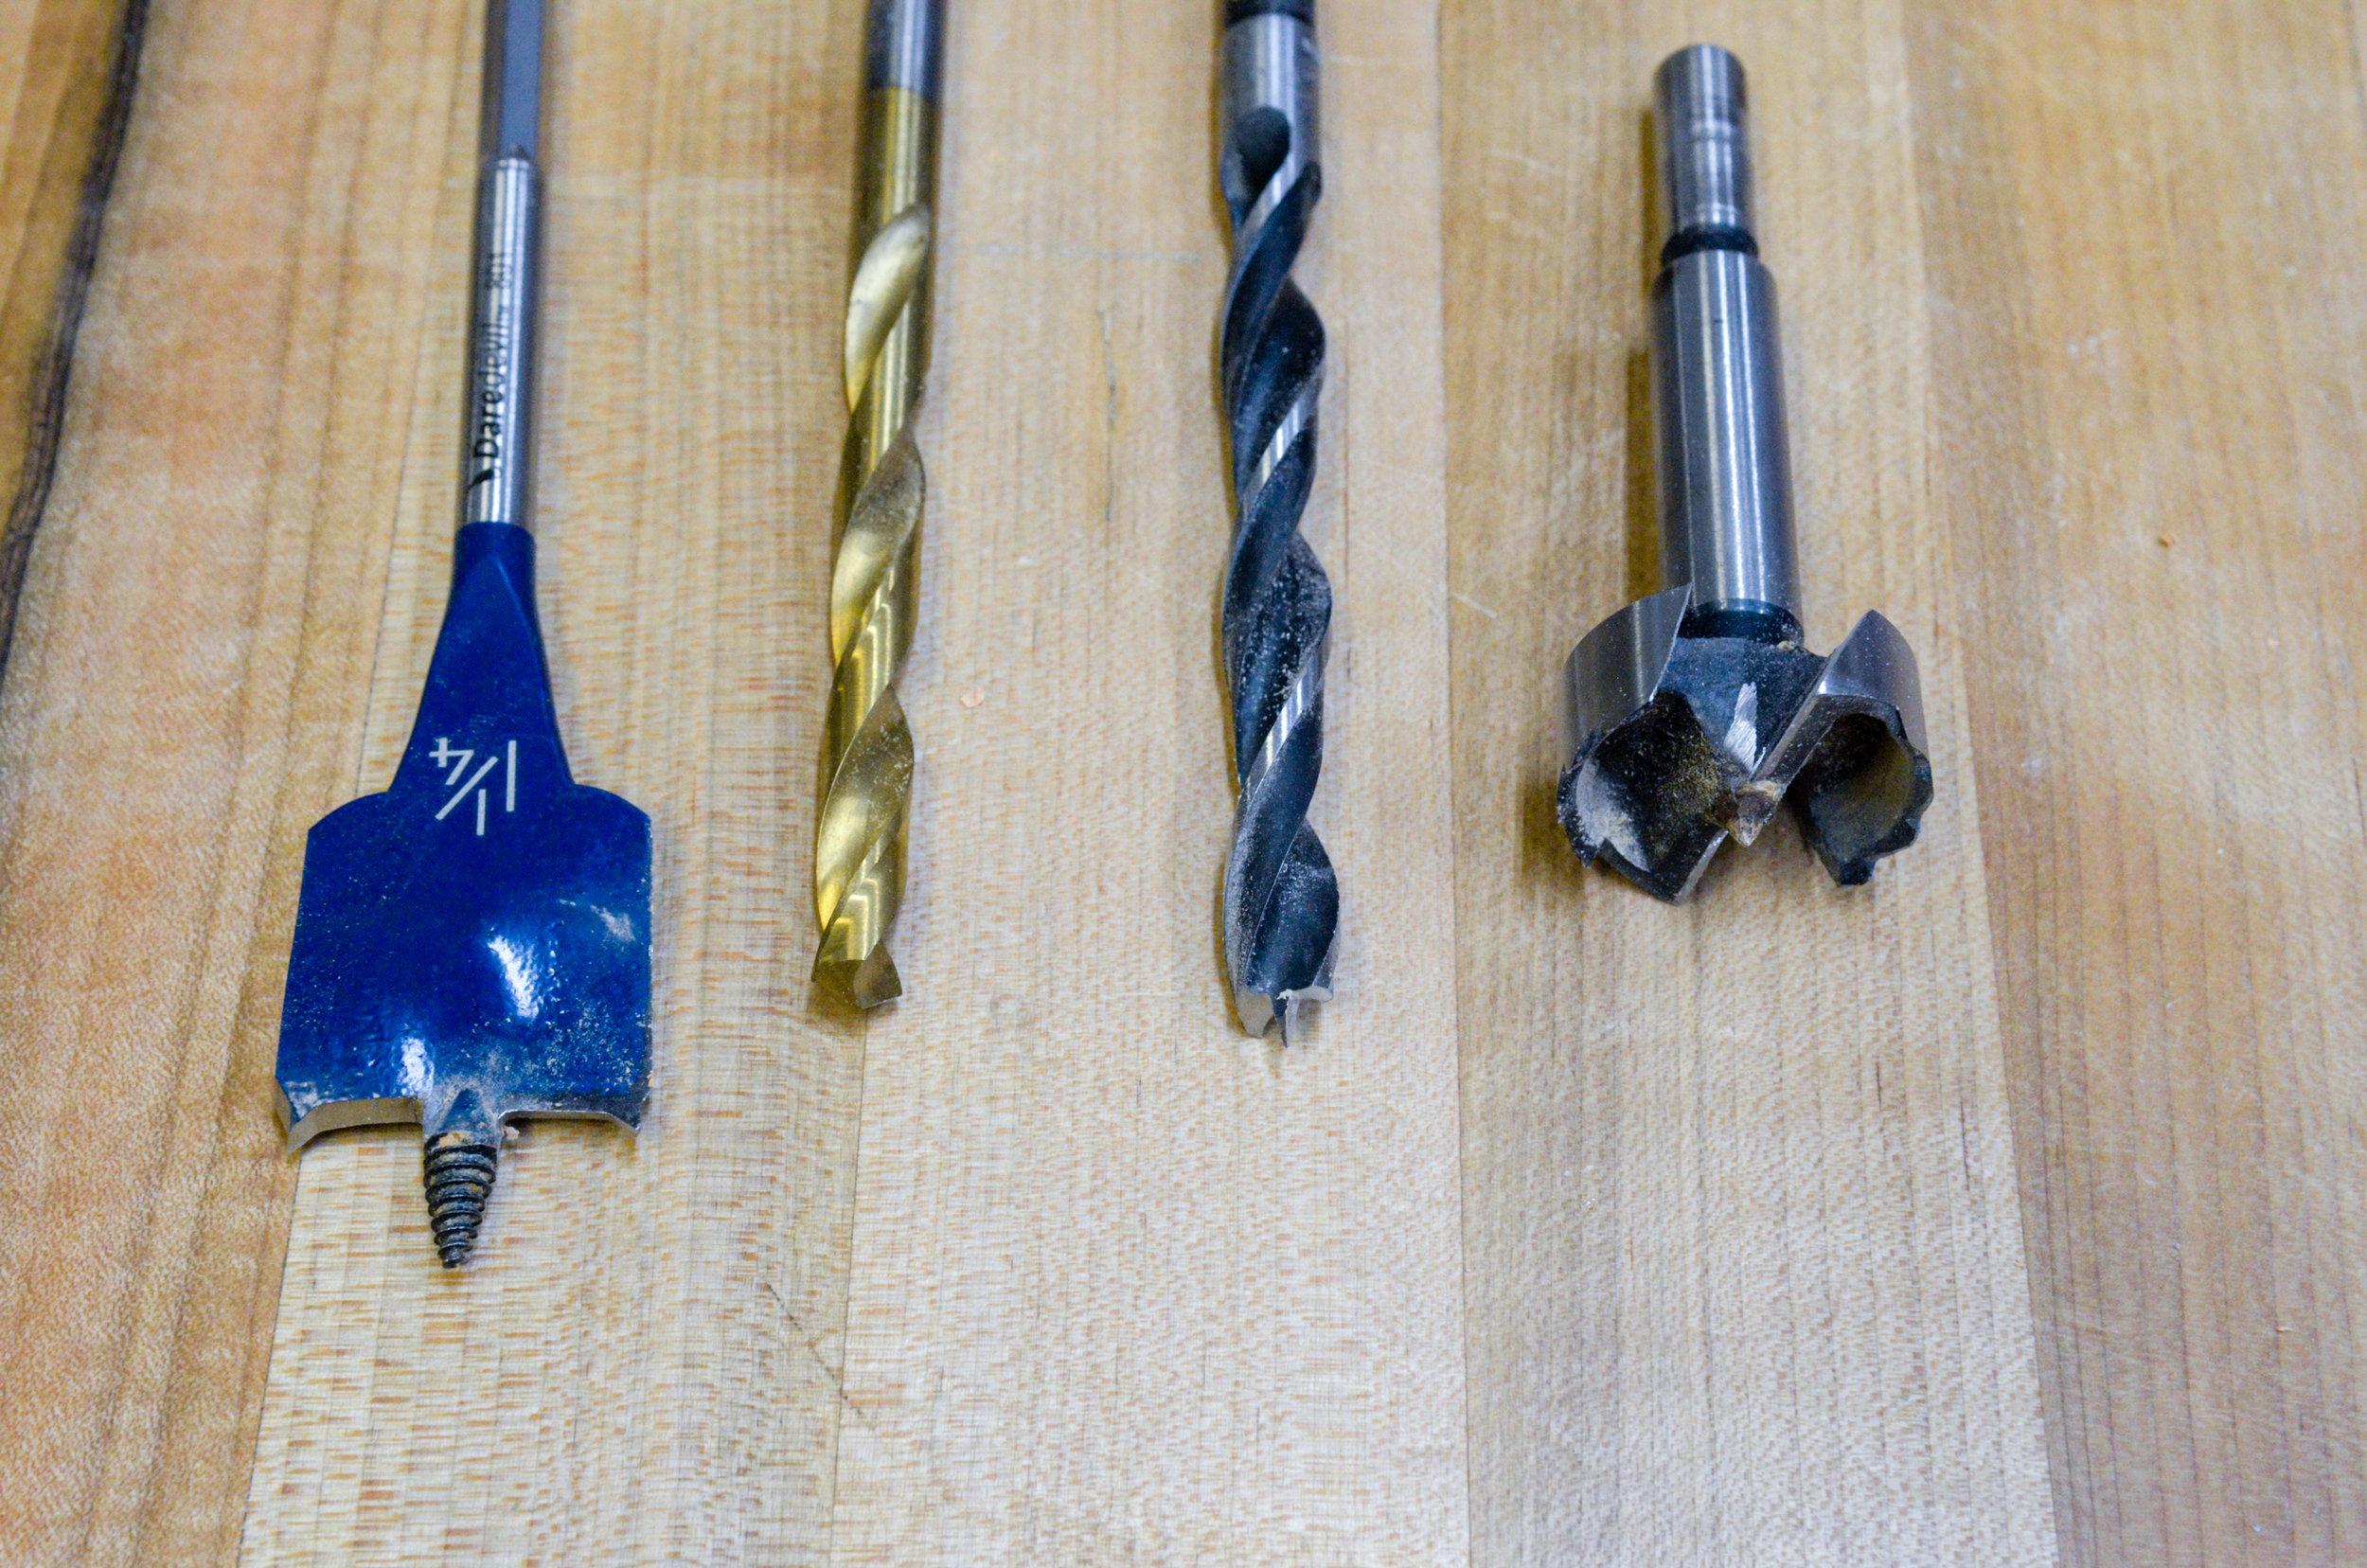 A visual comparison between a spade bit, twist bit, brad point bit, and Forstner bit (left to right).